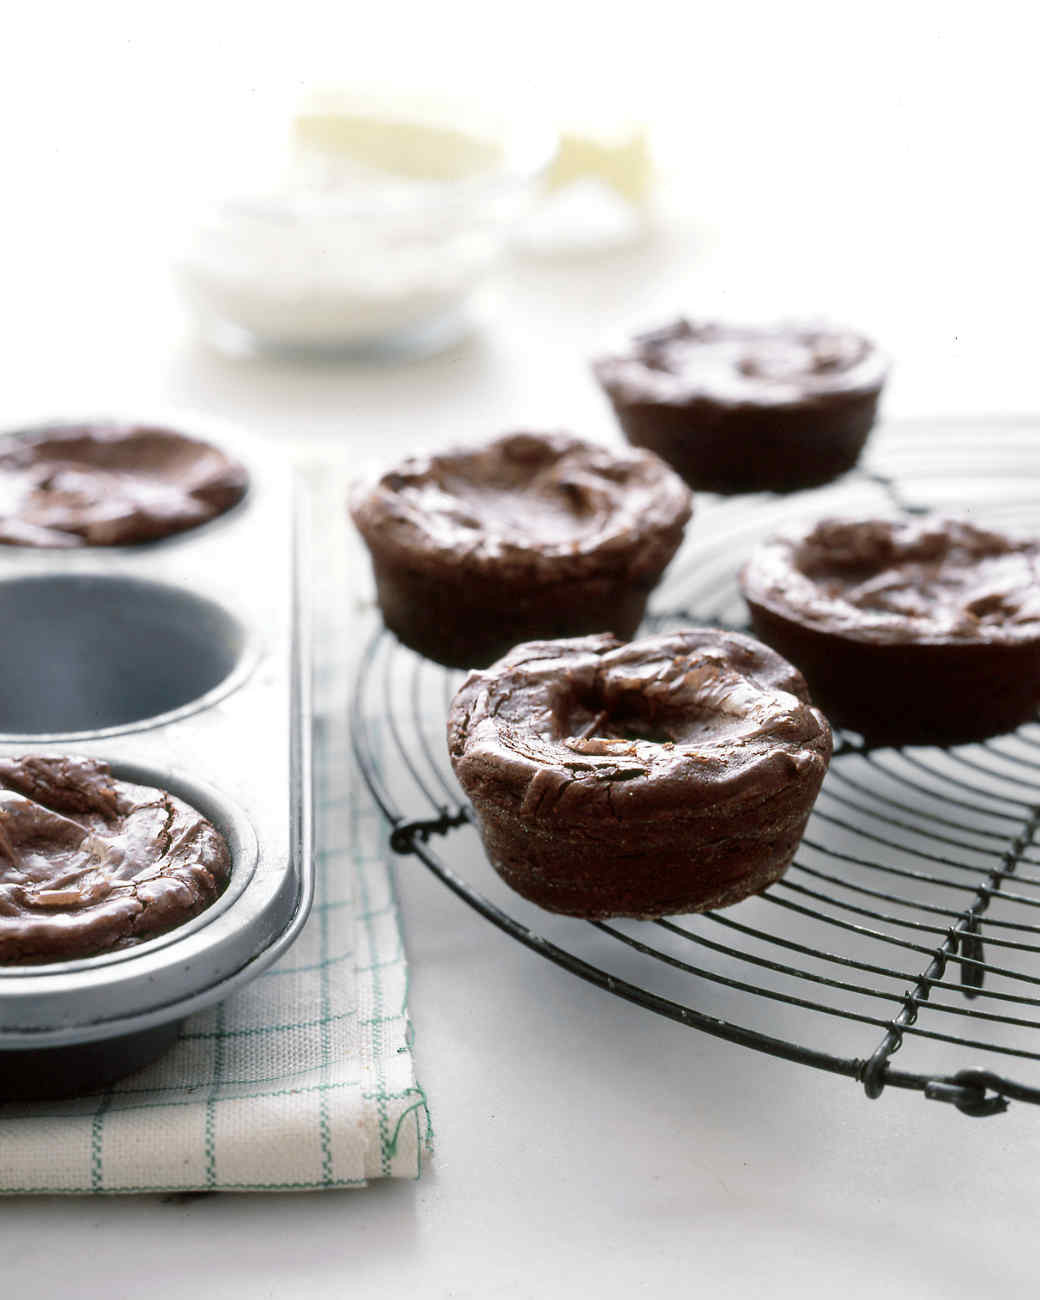 Chocolate Truffle Desserts  Chocolate Truffle Cakes Recipe